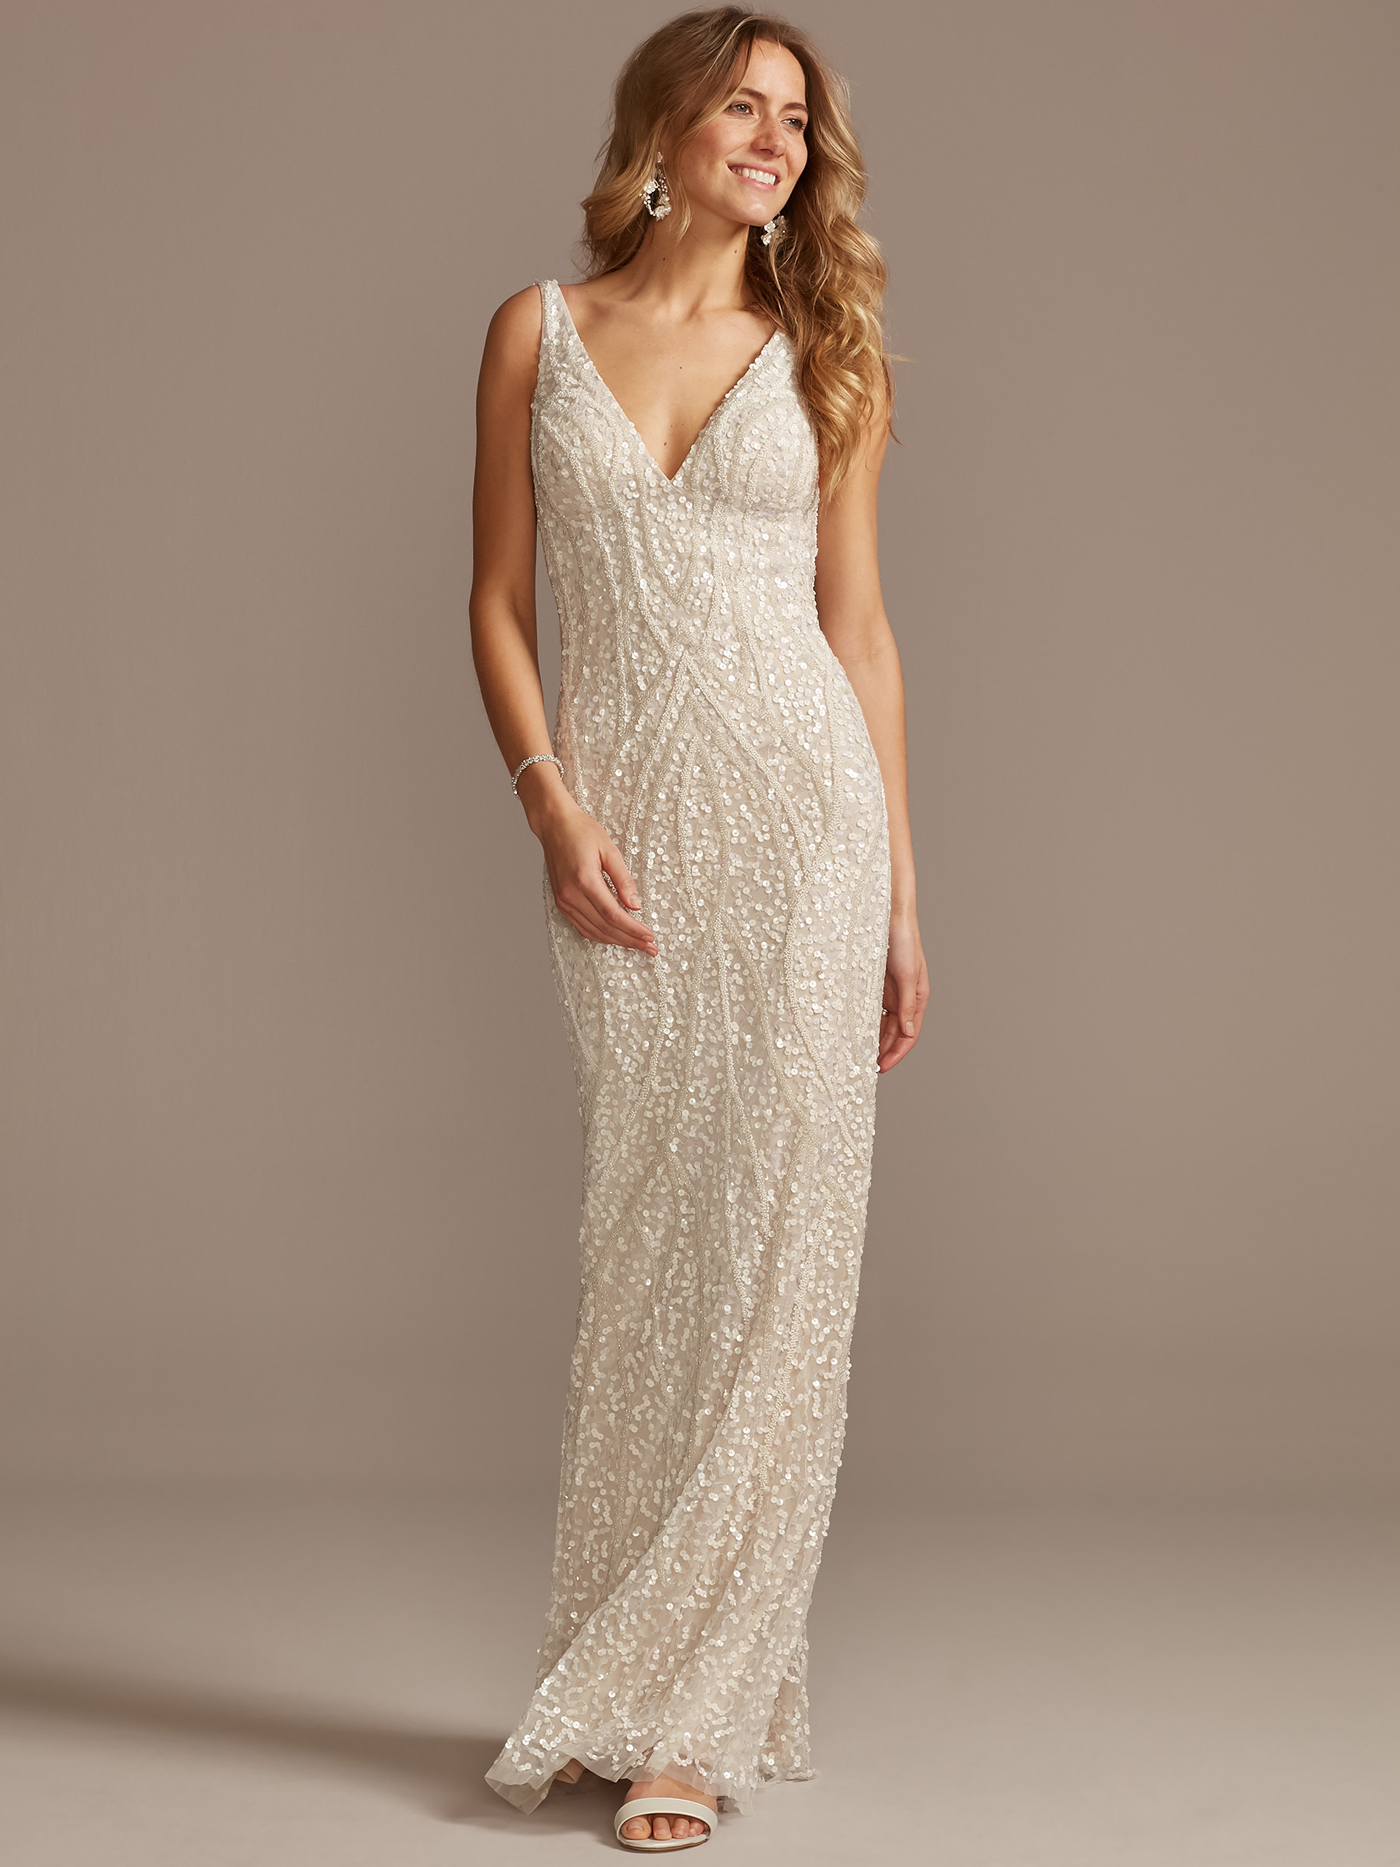 davids bridal bead embroidered a-line wedding dress spring 2021